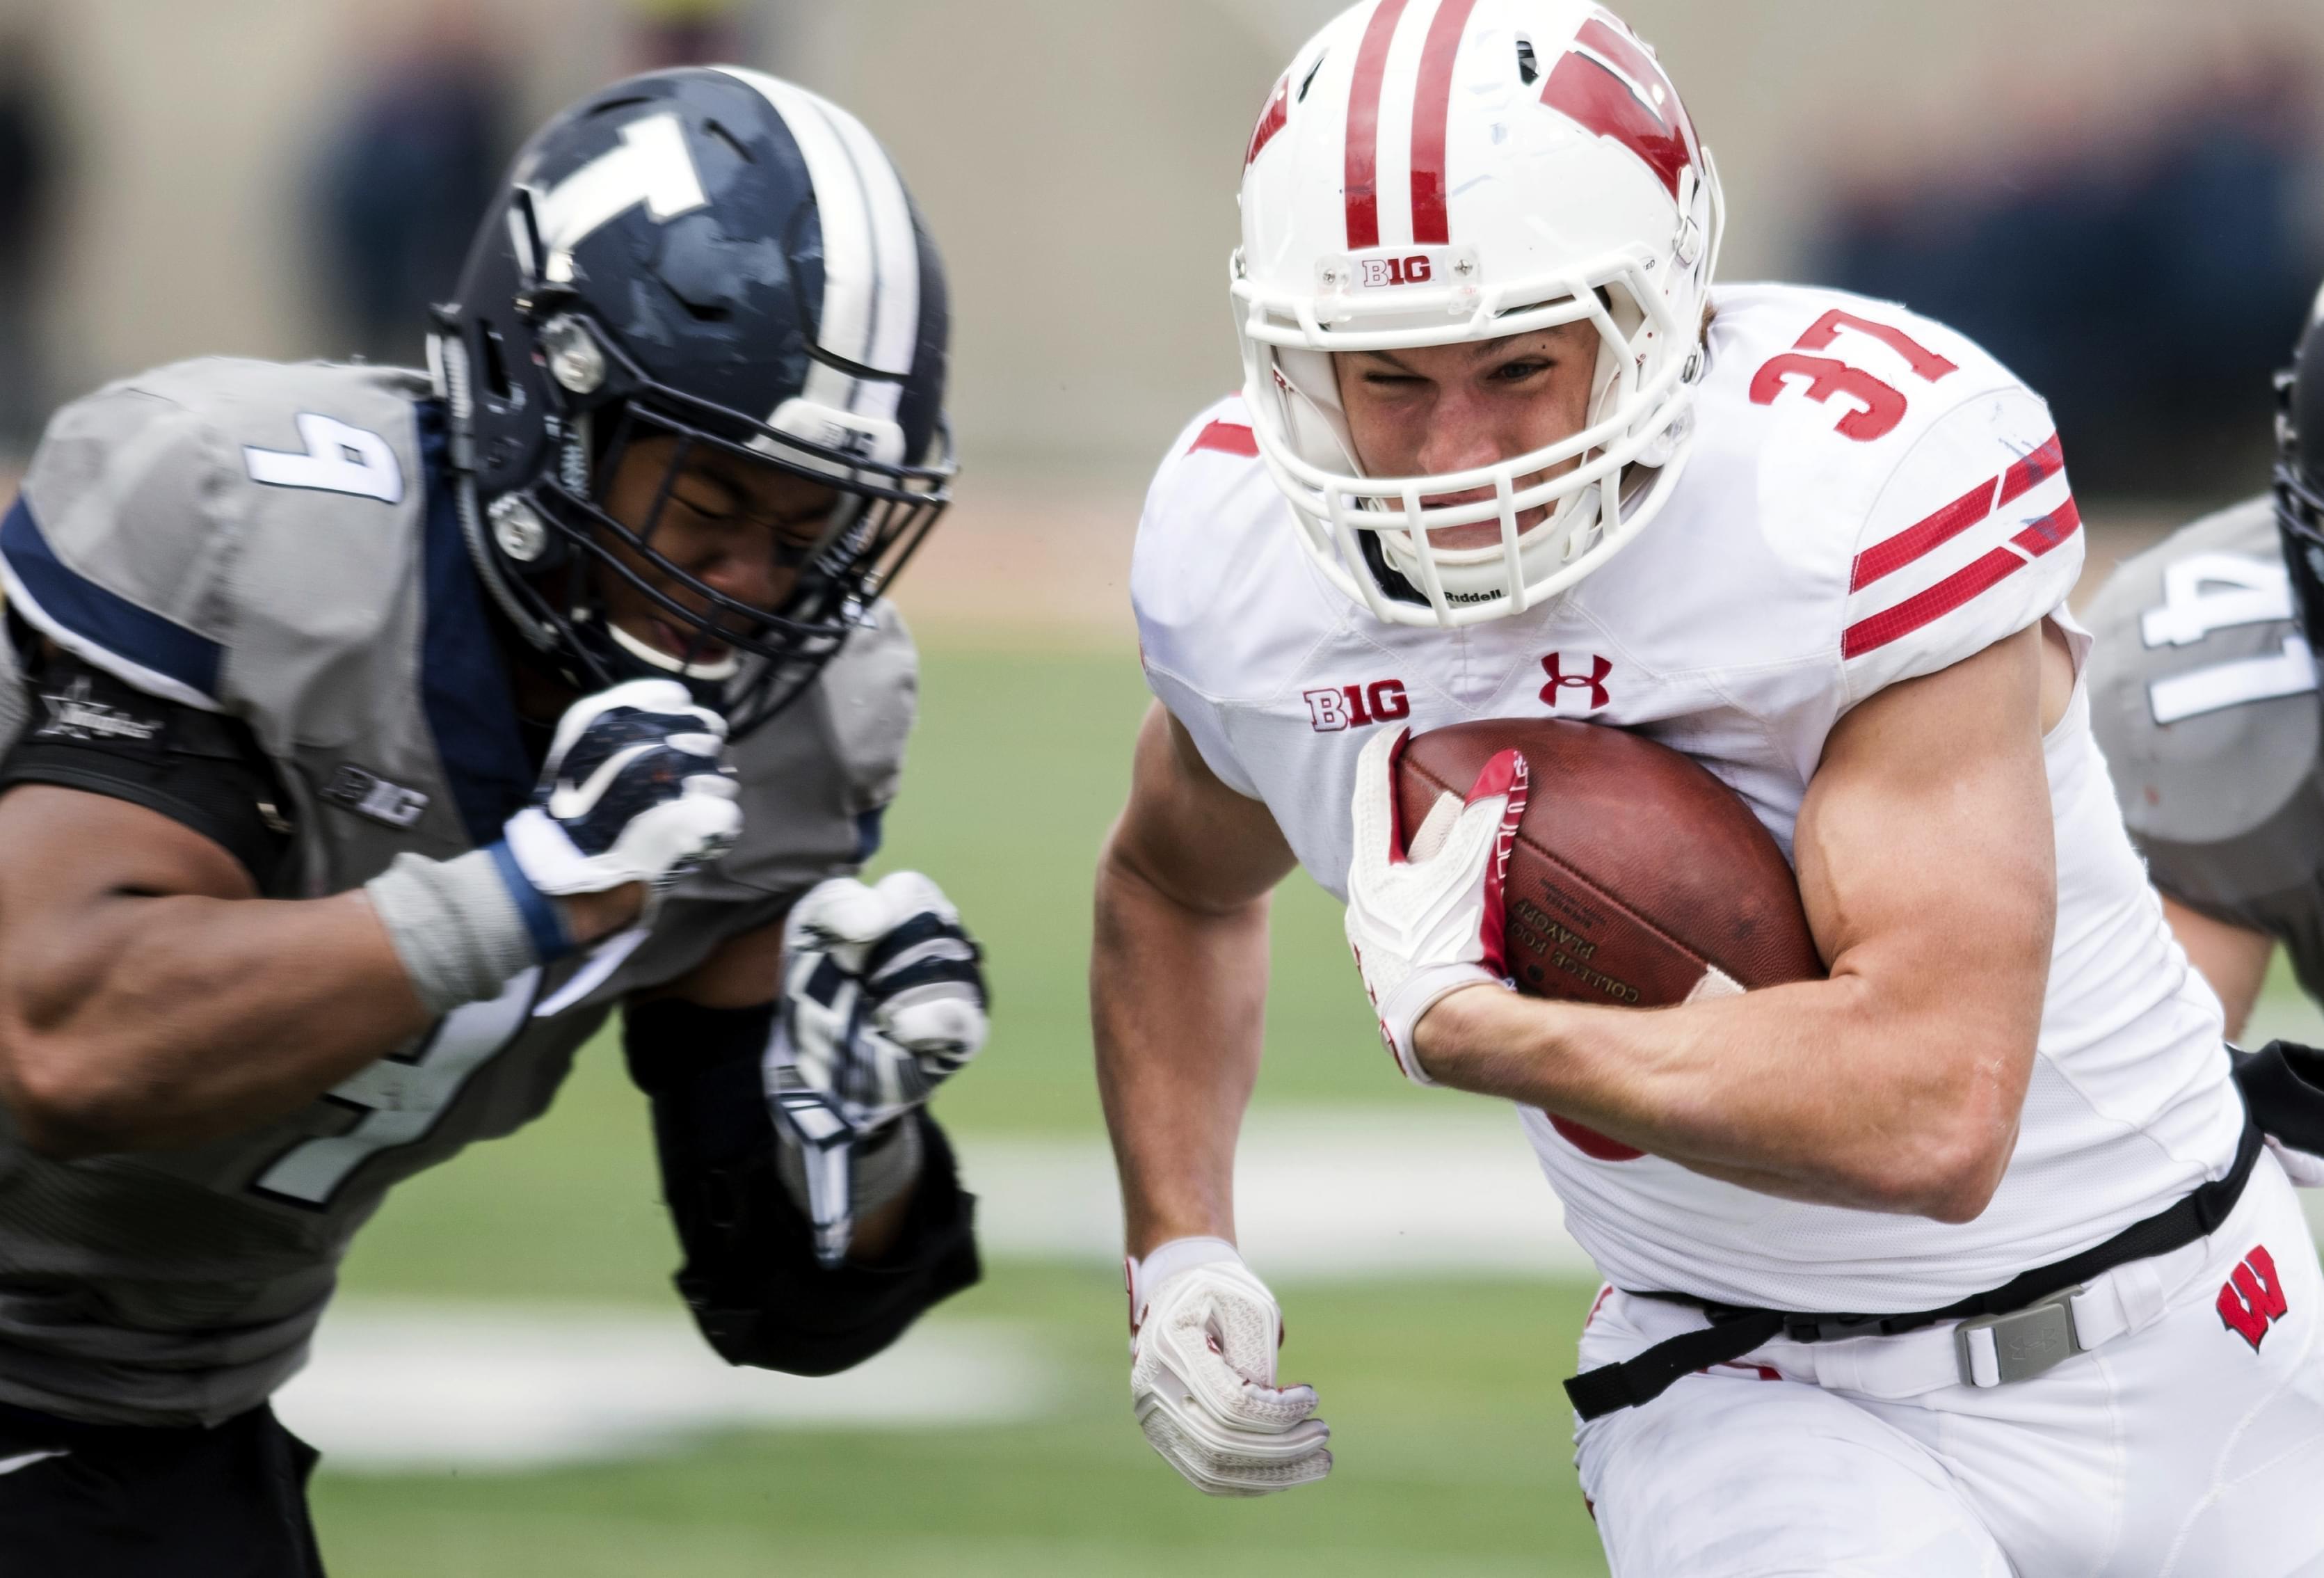 Wisconsin running back Garrett Groshek tries to avoid a tackle by Illinois linebacker Dele Harding.